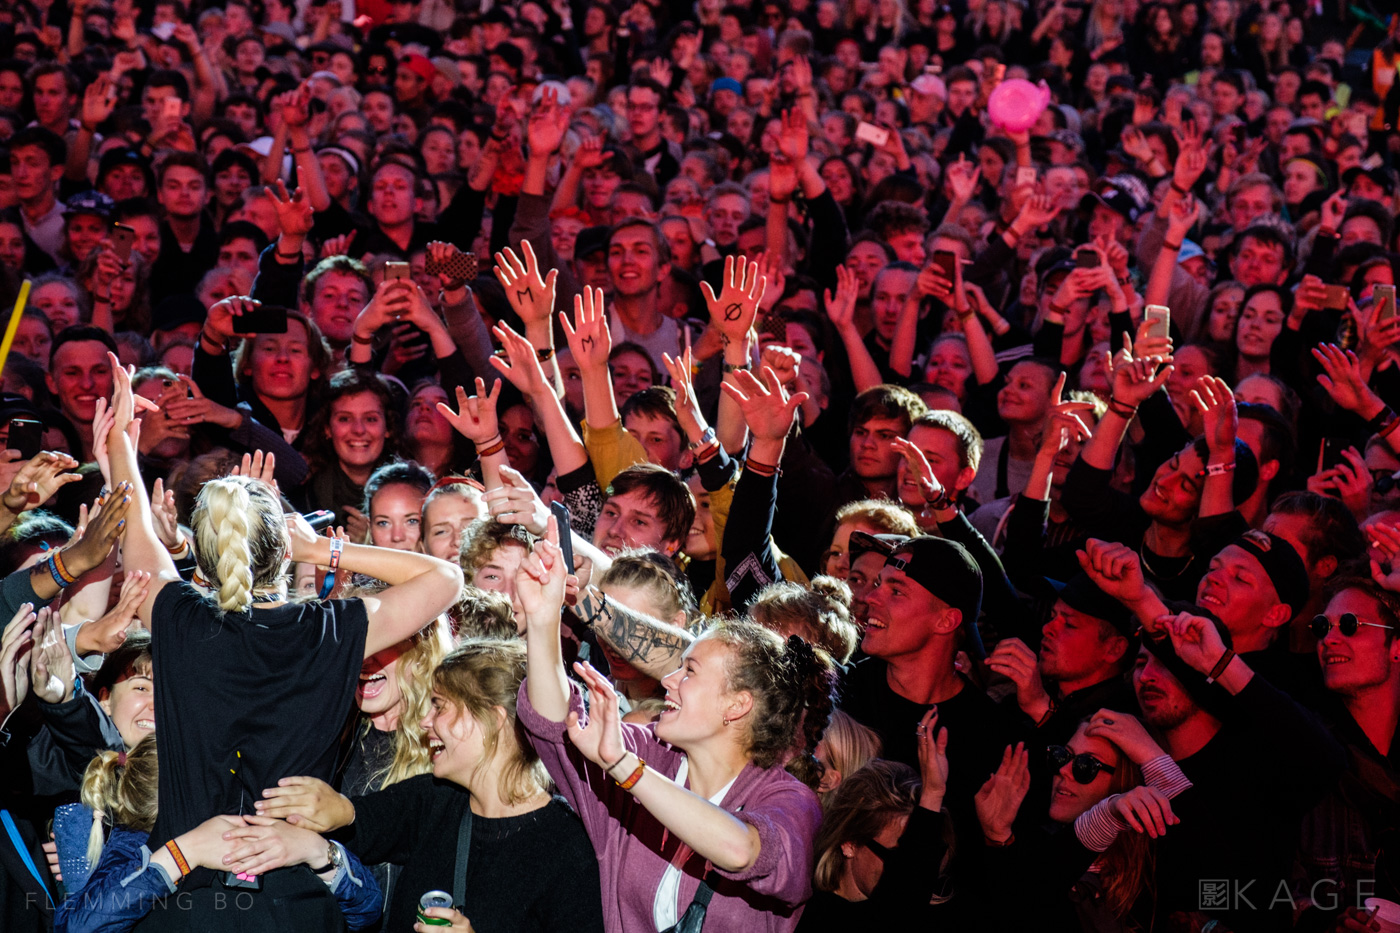 MØ performs at Orange Stage at Roskilde Festival in Roskilde, Denmark on July 2nd, 2016